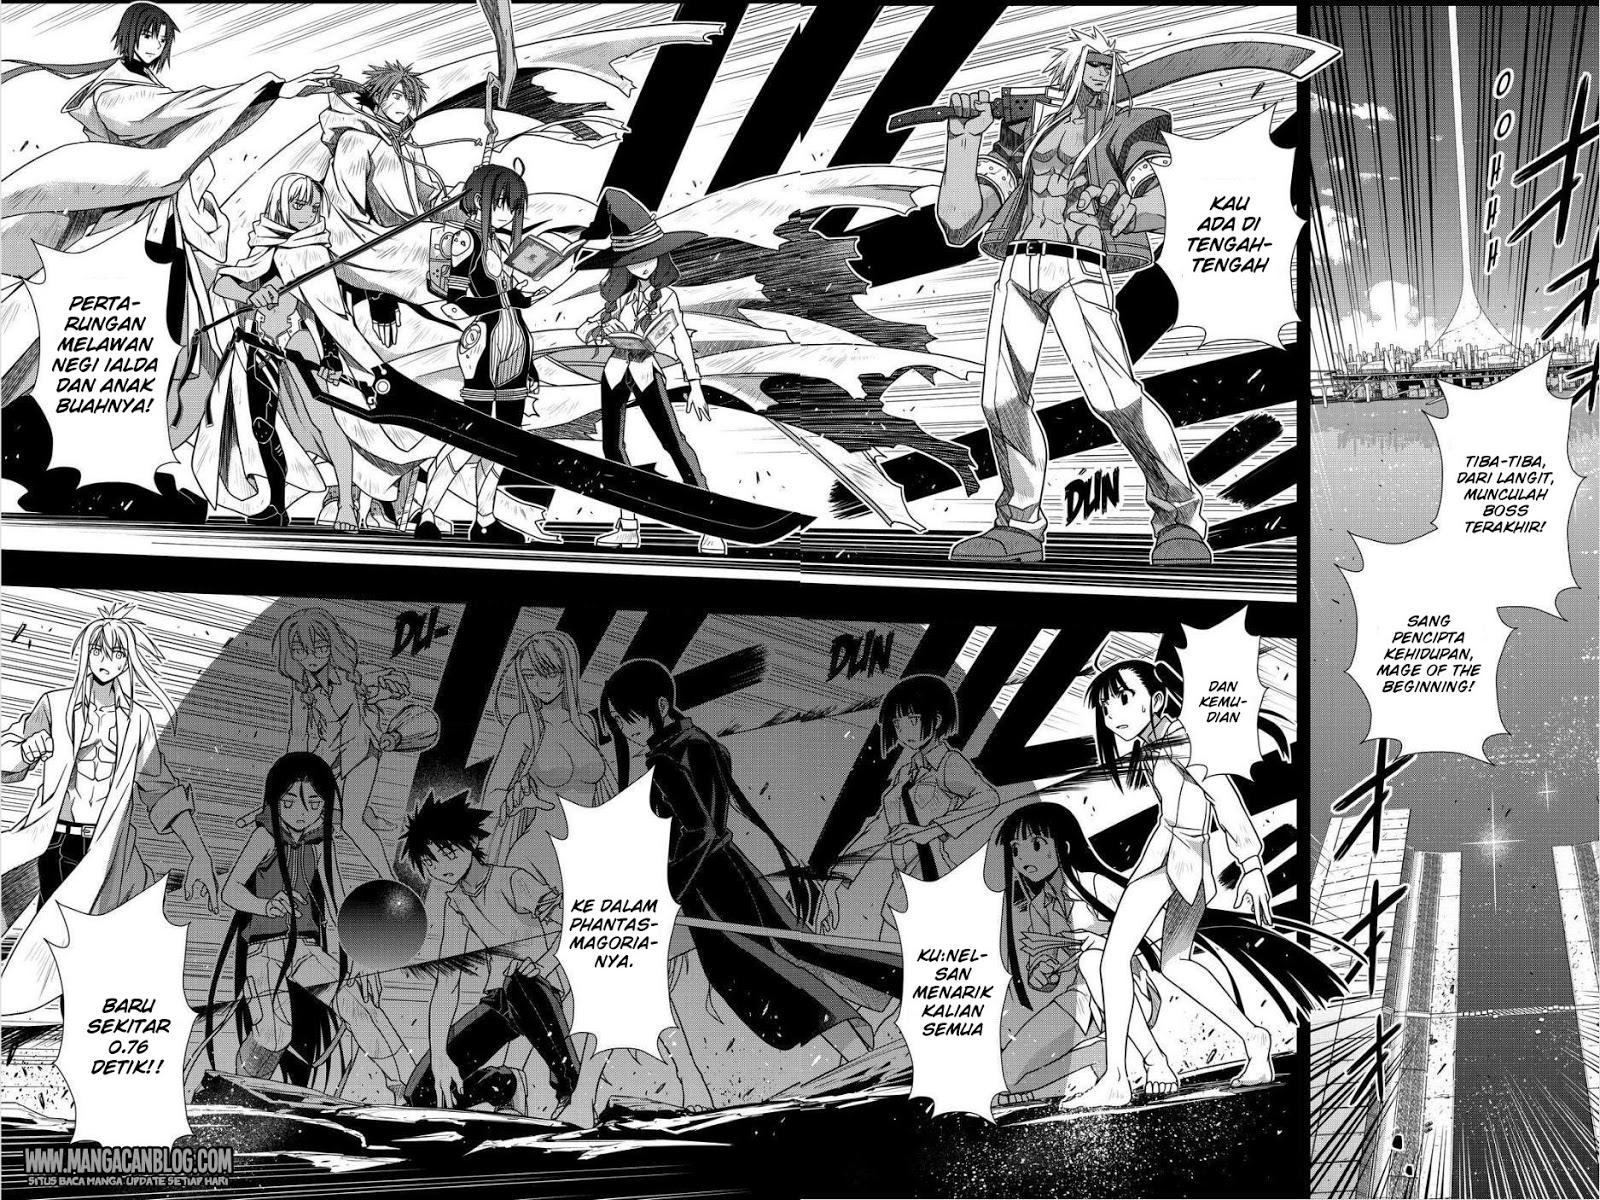 Komik uq holder 131 - harapan dan rencana putri kekaisaran 132 Indonesia uq holder 131 - harapan dan rencana putri kekaisaran Terbaru 15|Baca Manga Komik Indonesia